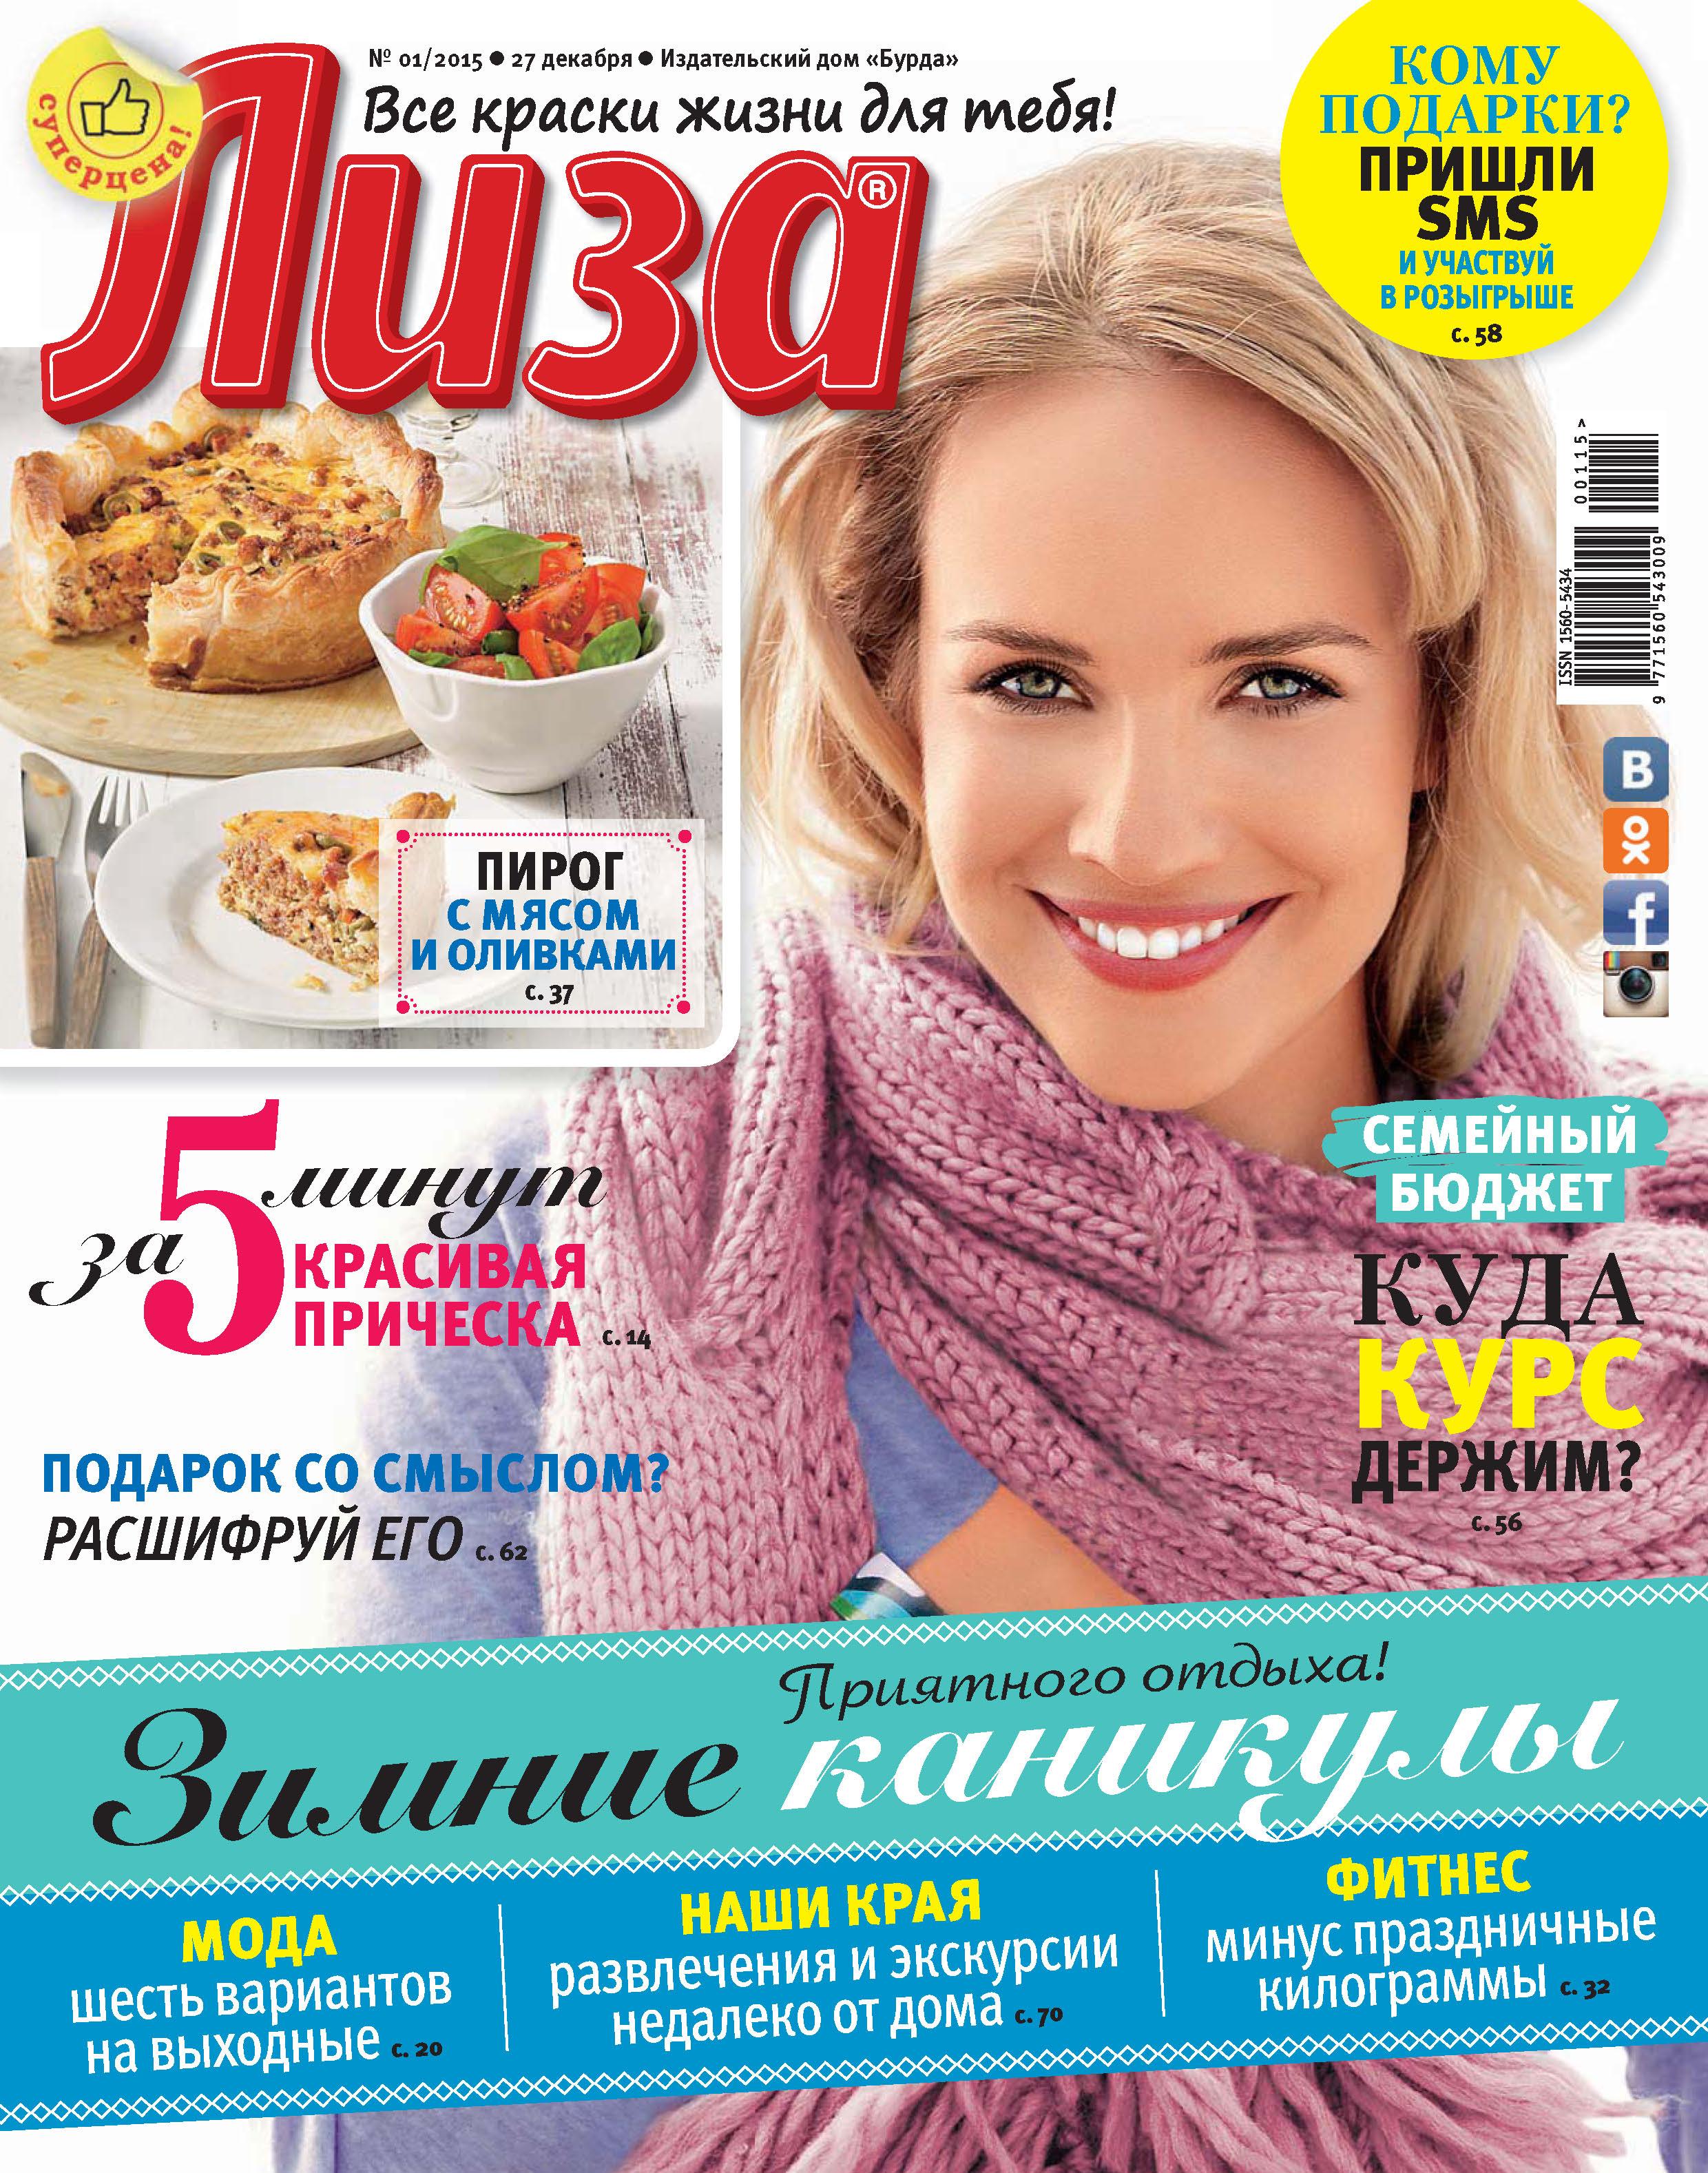 ИД «Бурда» Журнал «Лиза» №01/2015 ид бурда журнал лиза 13 2015